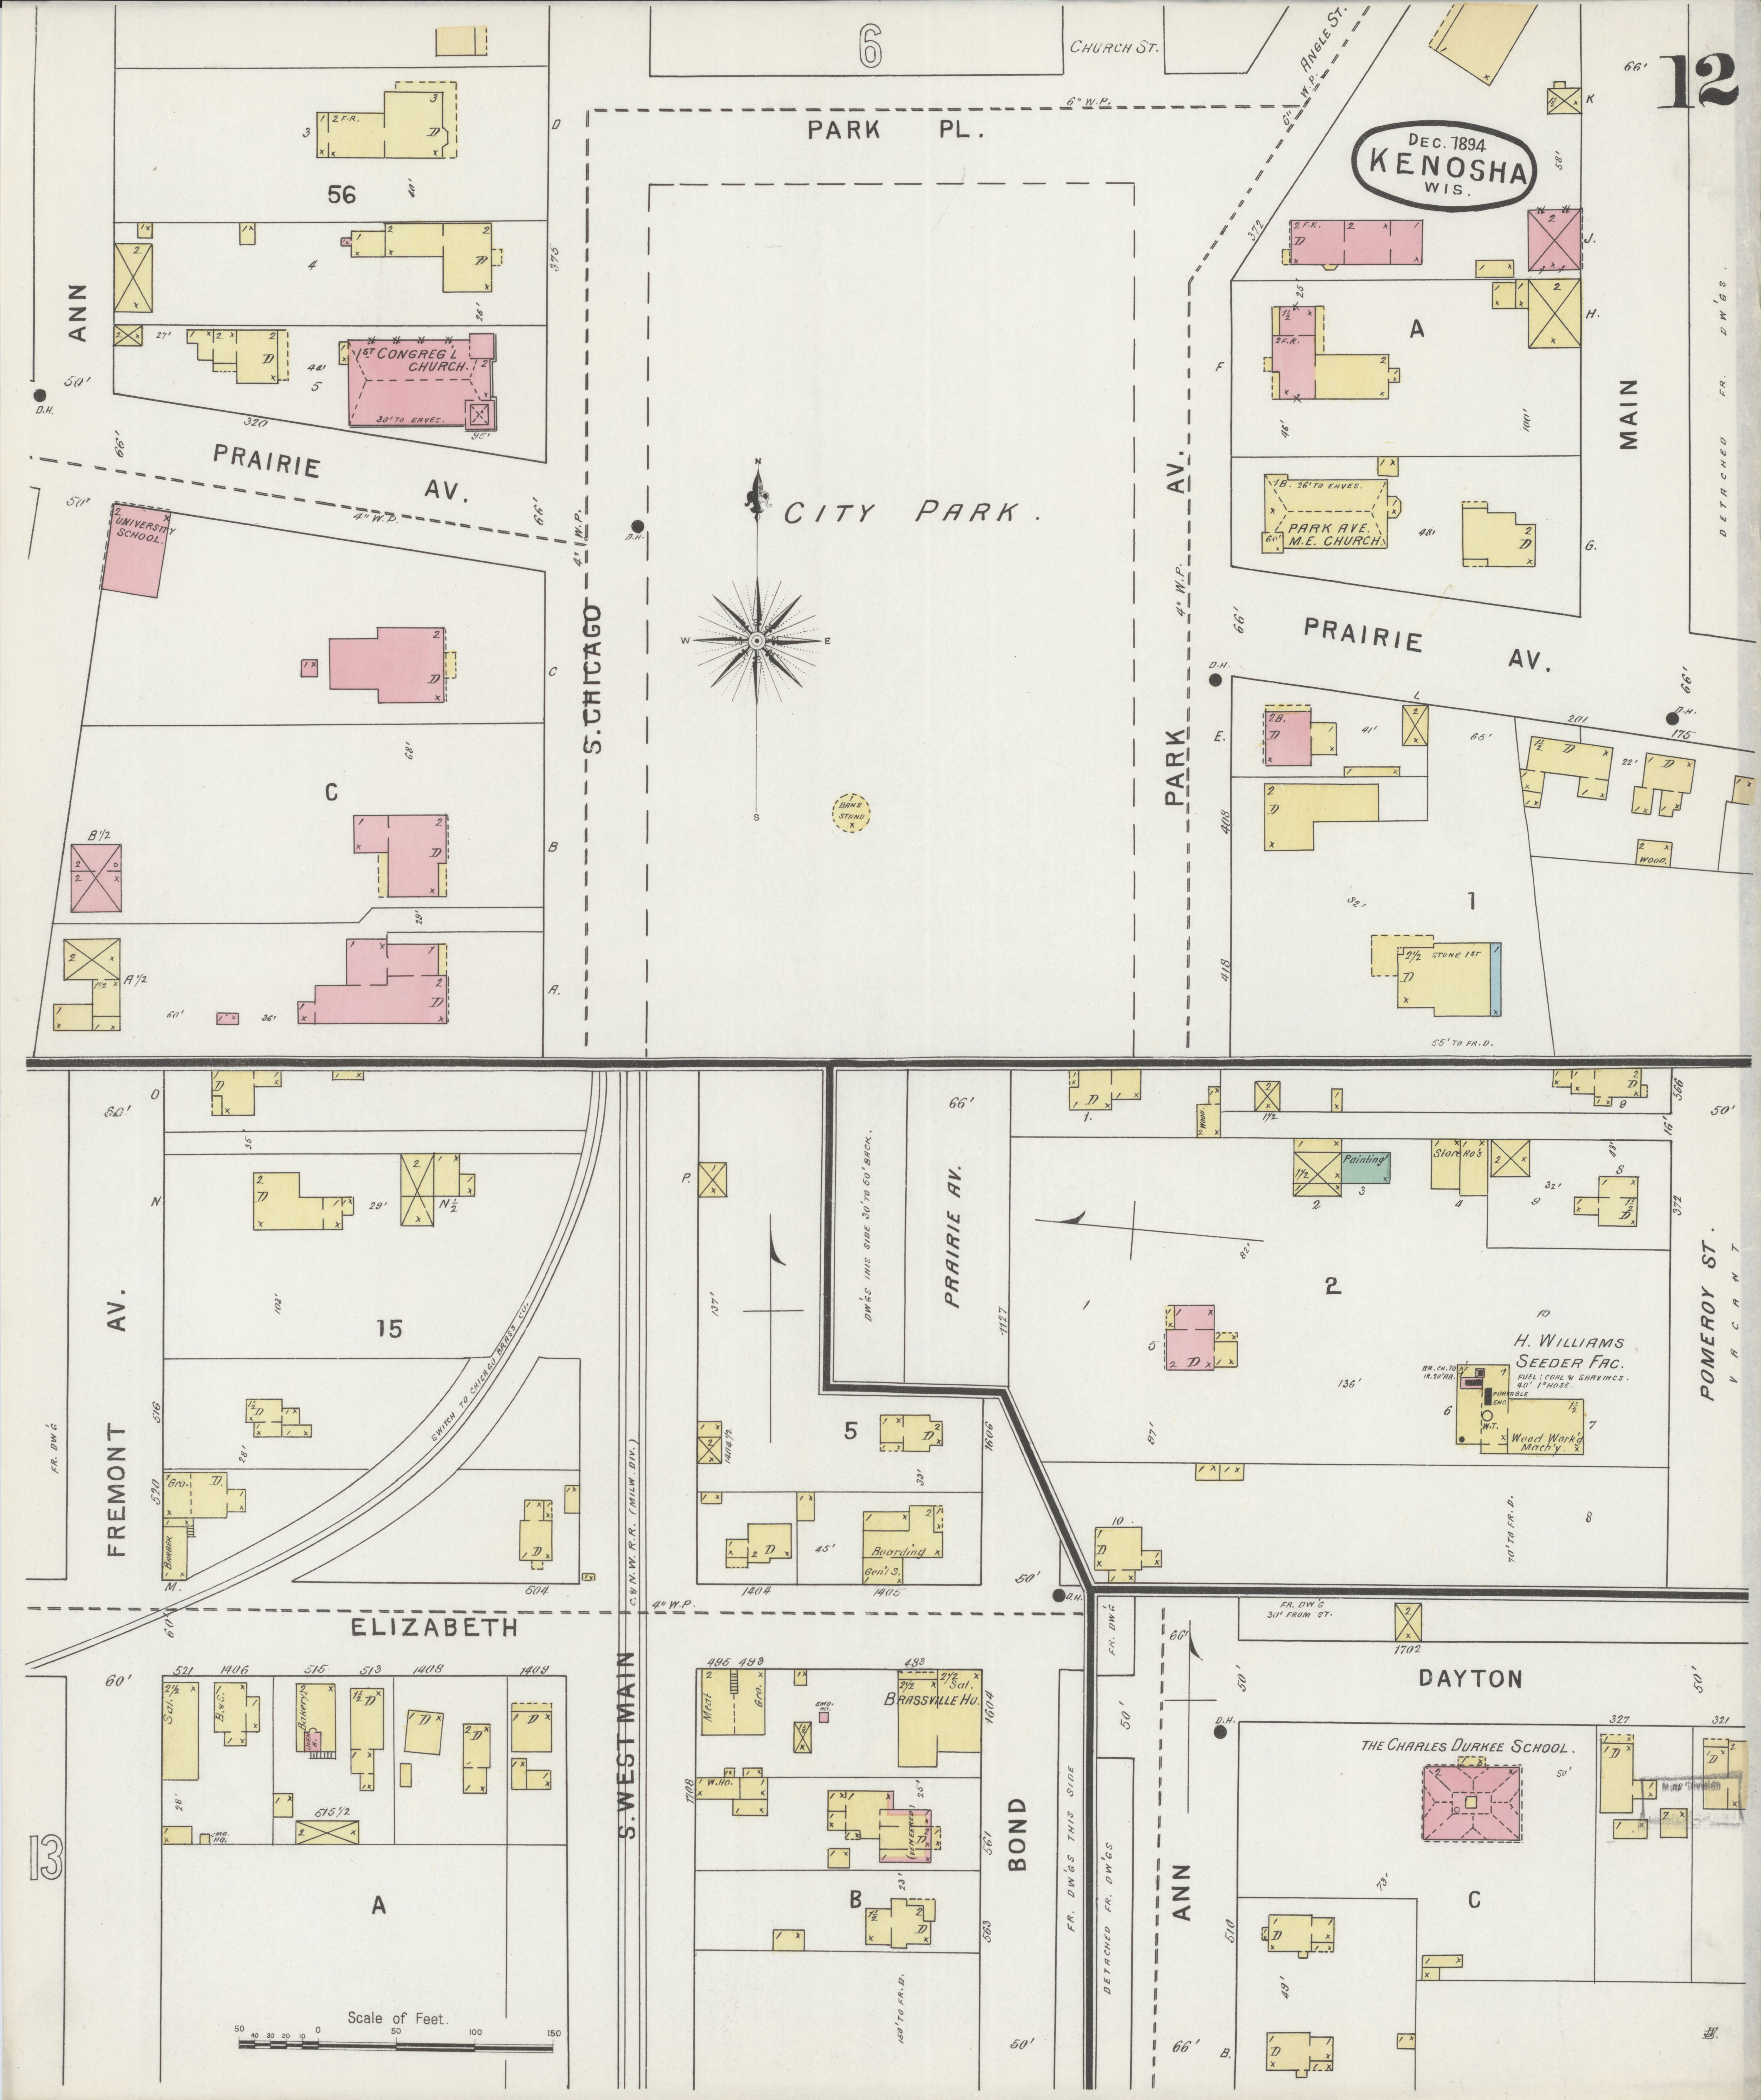 File:Sanborn Fire Insurance Map from Kenosha, Kenosha County ... on grand chute map, superior map, fond du lac zip code map, norman map, lafayette map, wilmot map, peoria map, st francis map, woodstock map, sheboygan map, fennimore map, oconomowoc map, wausau map, schererville map, prairie crossing map, waukesha map, door map, city of racine map, racine wisconsin map, greensboro map,